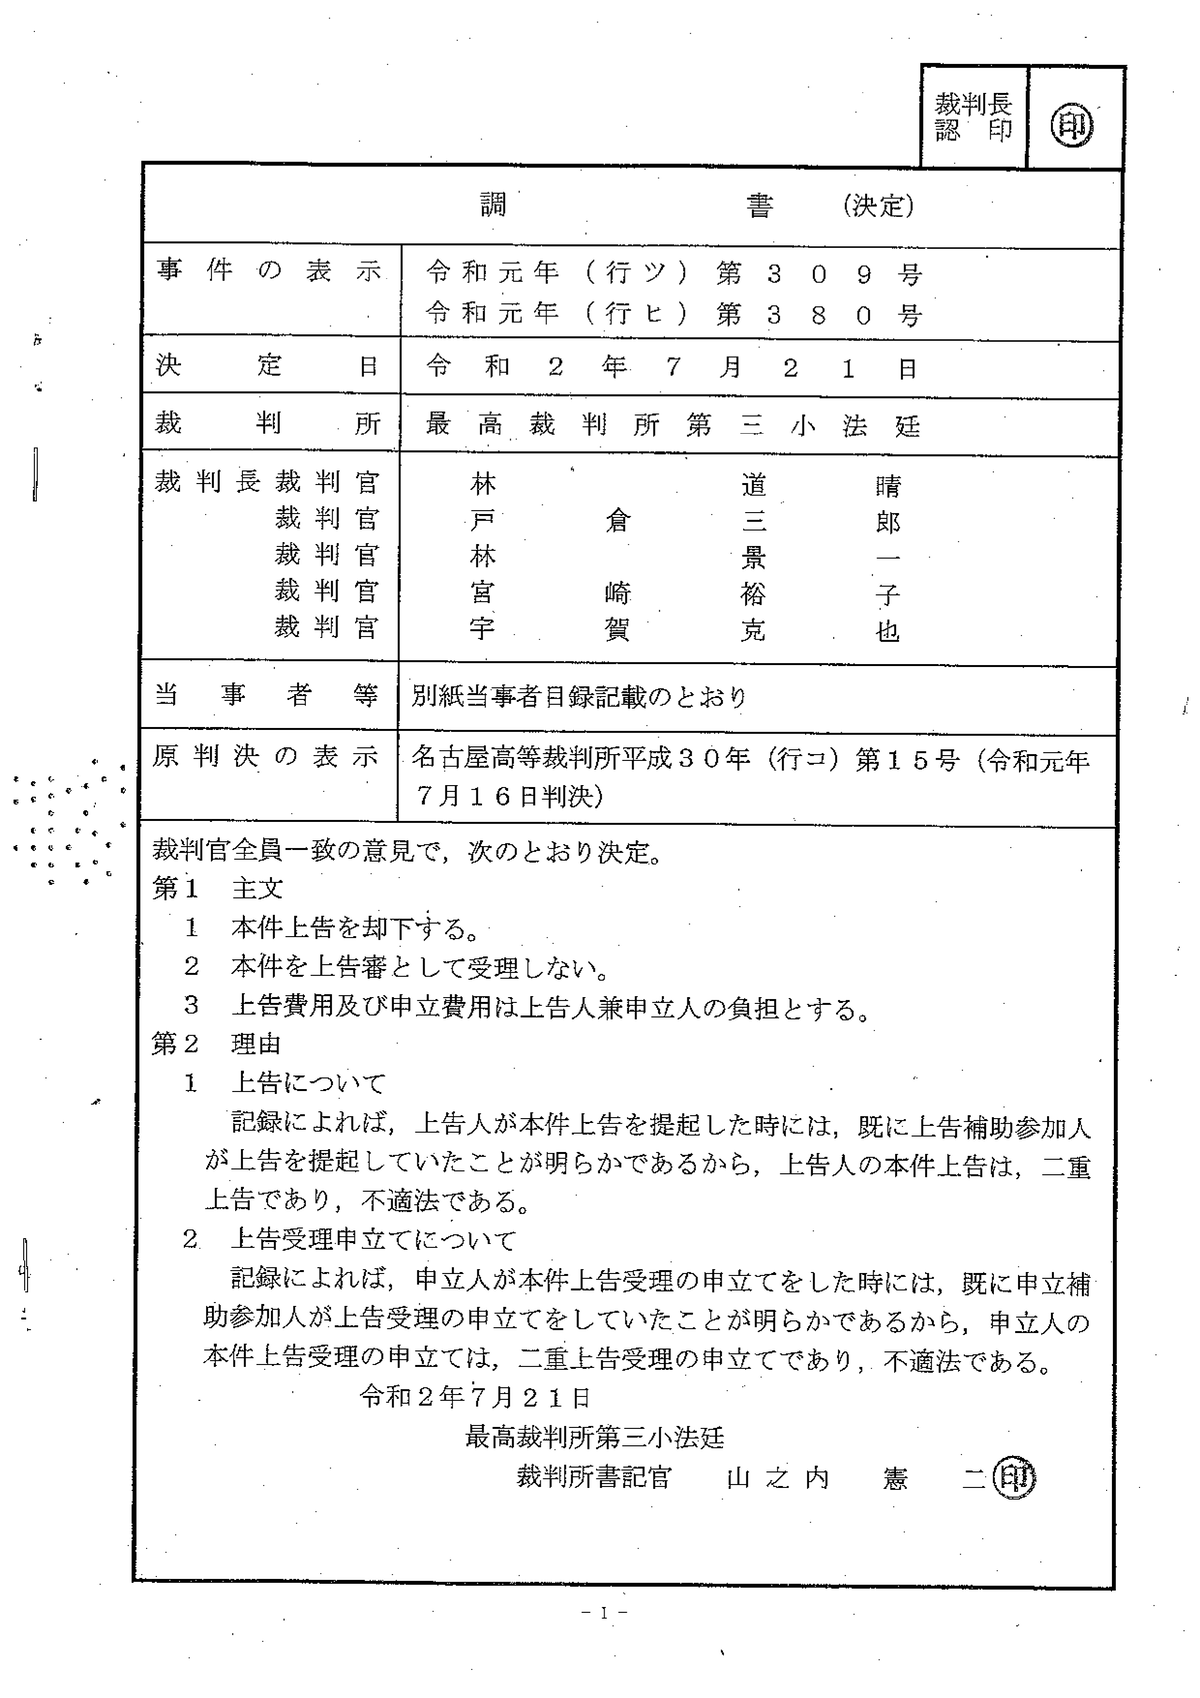 200722_R020722_03